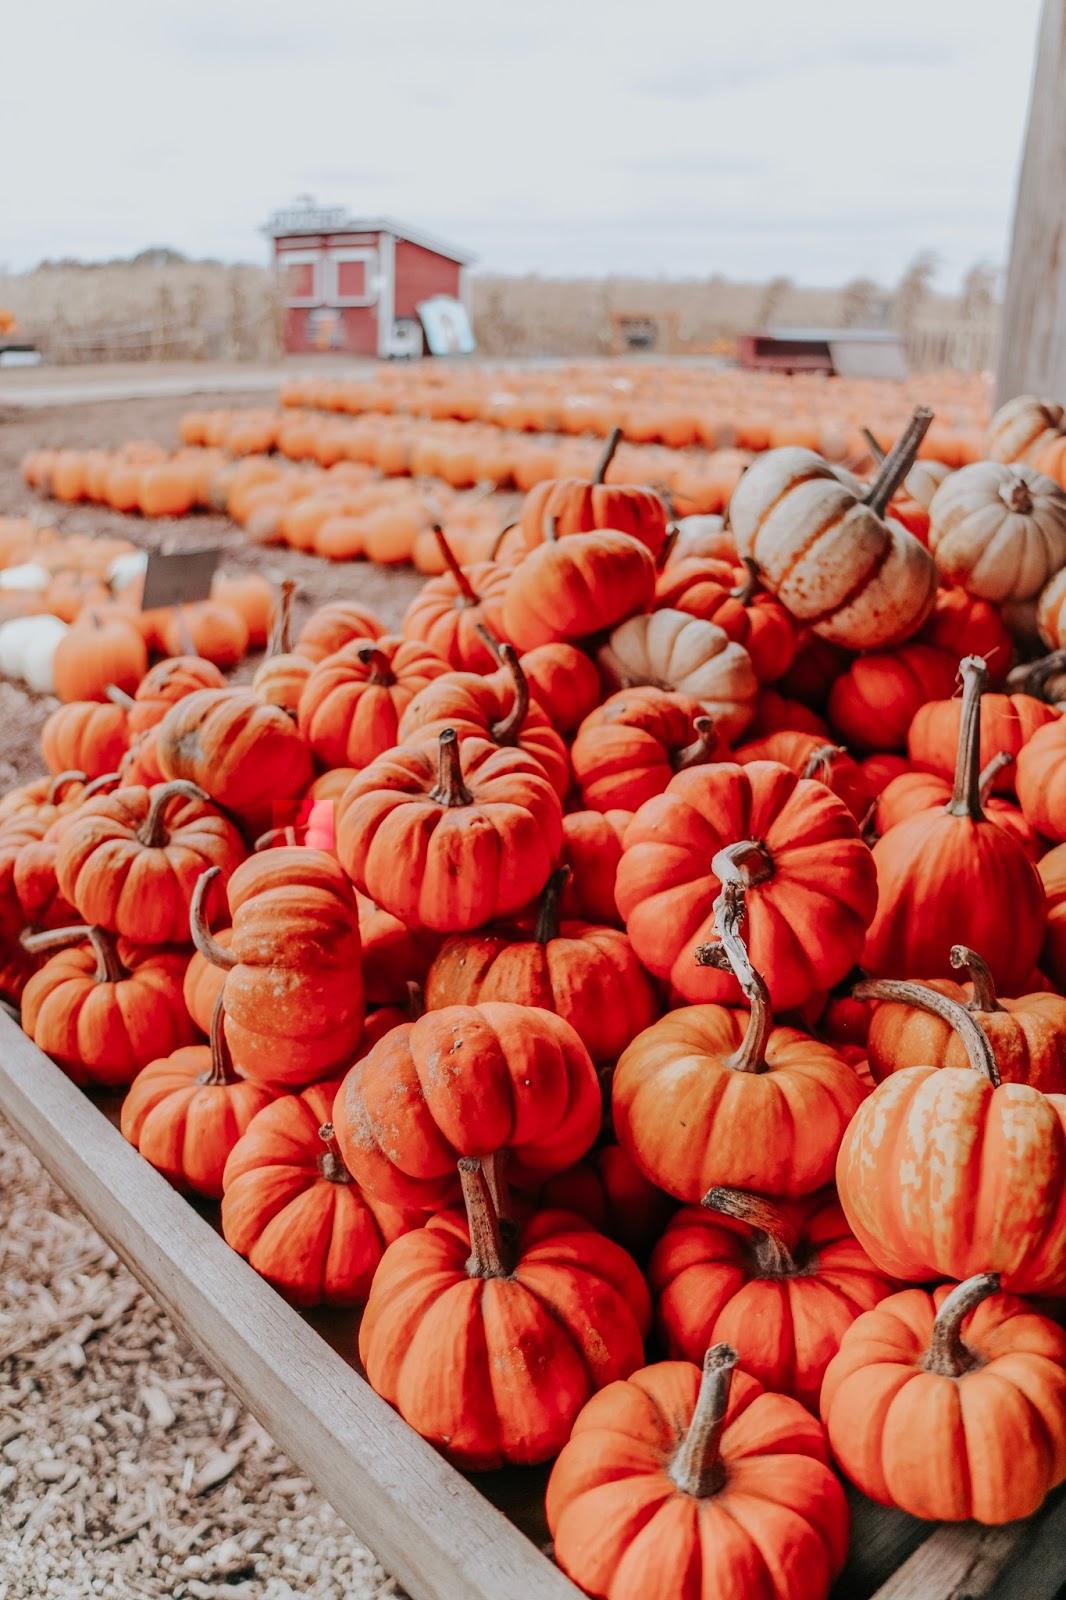 Colorful mini pumpkins at Schuster's Farm in Deerfield, Wisconsin